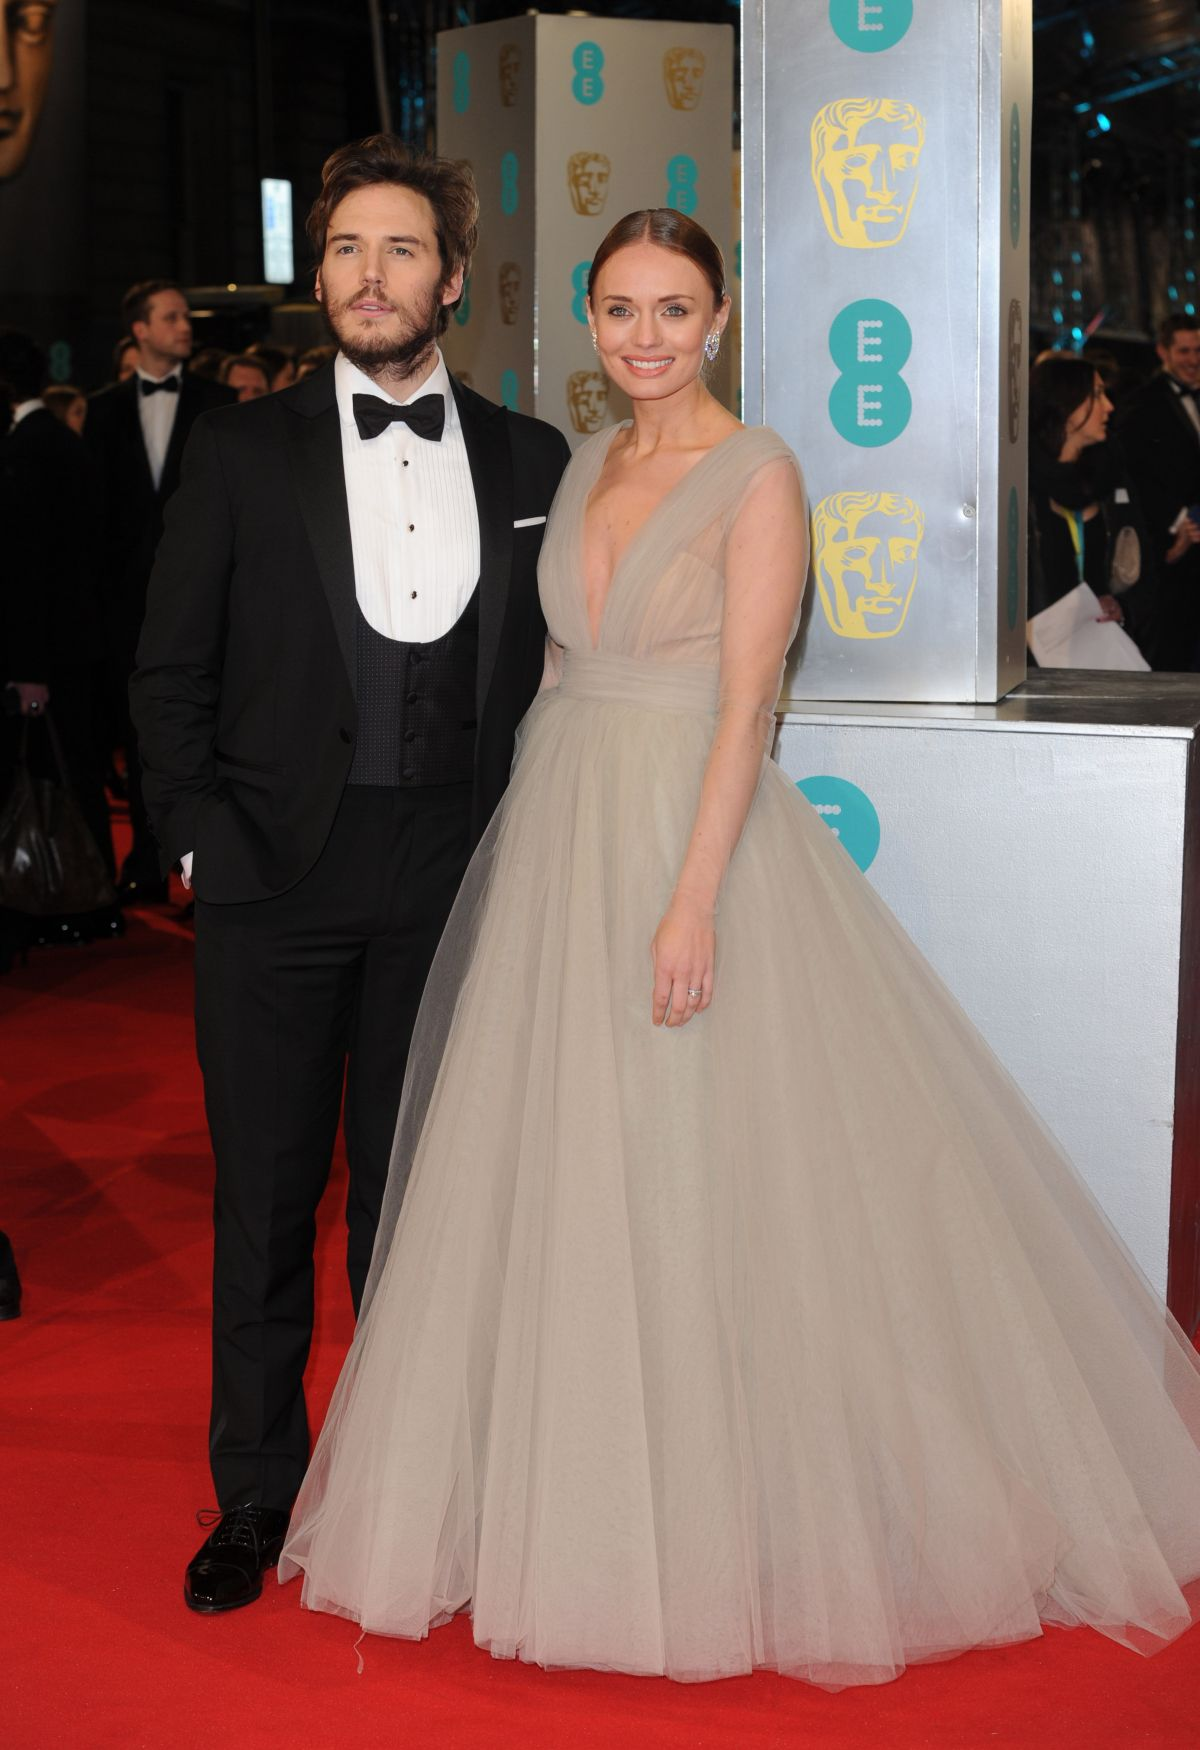 LAURA HADDOCK at 2015 EE British Academy Film Awards in London